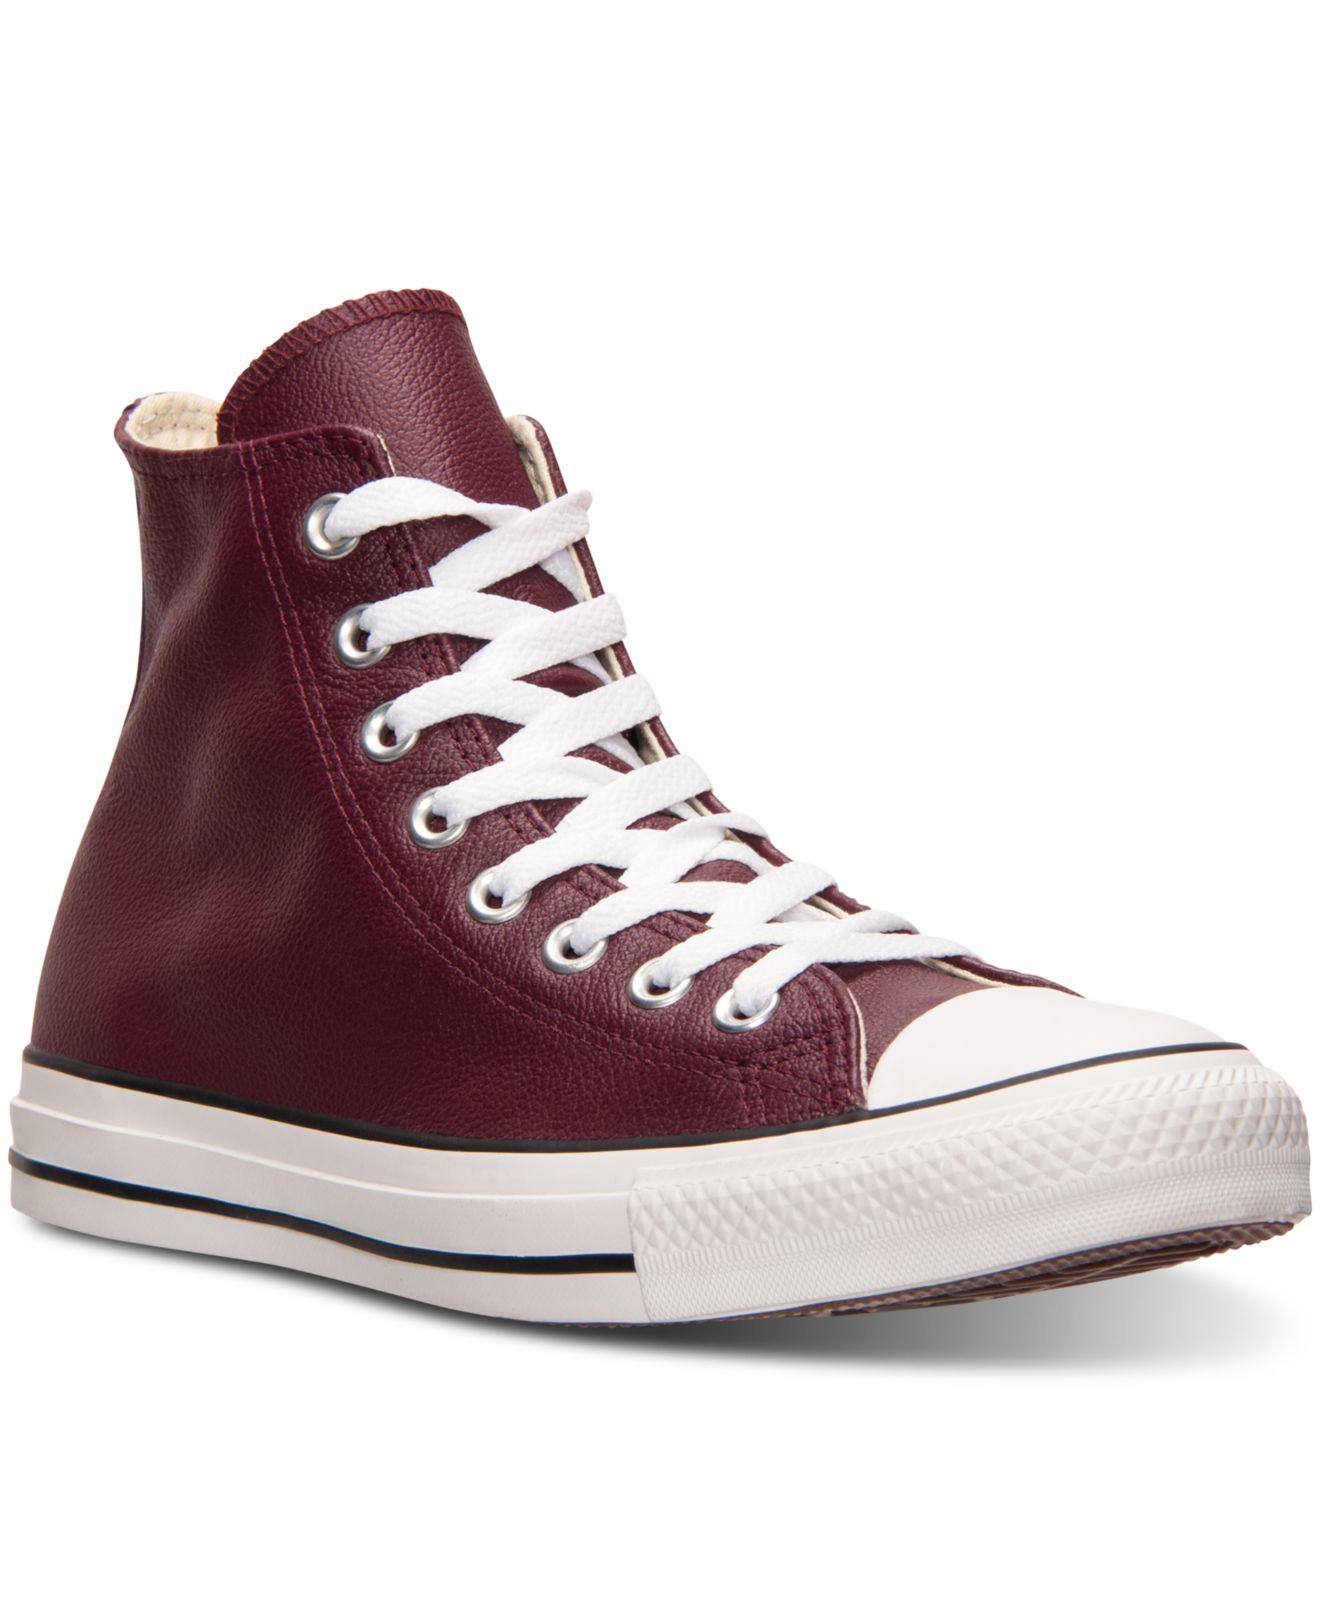 Lyst - Converse Men s Chuck Taylor All Star Hi Seasonal Leather ... 002a6f376